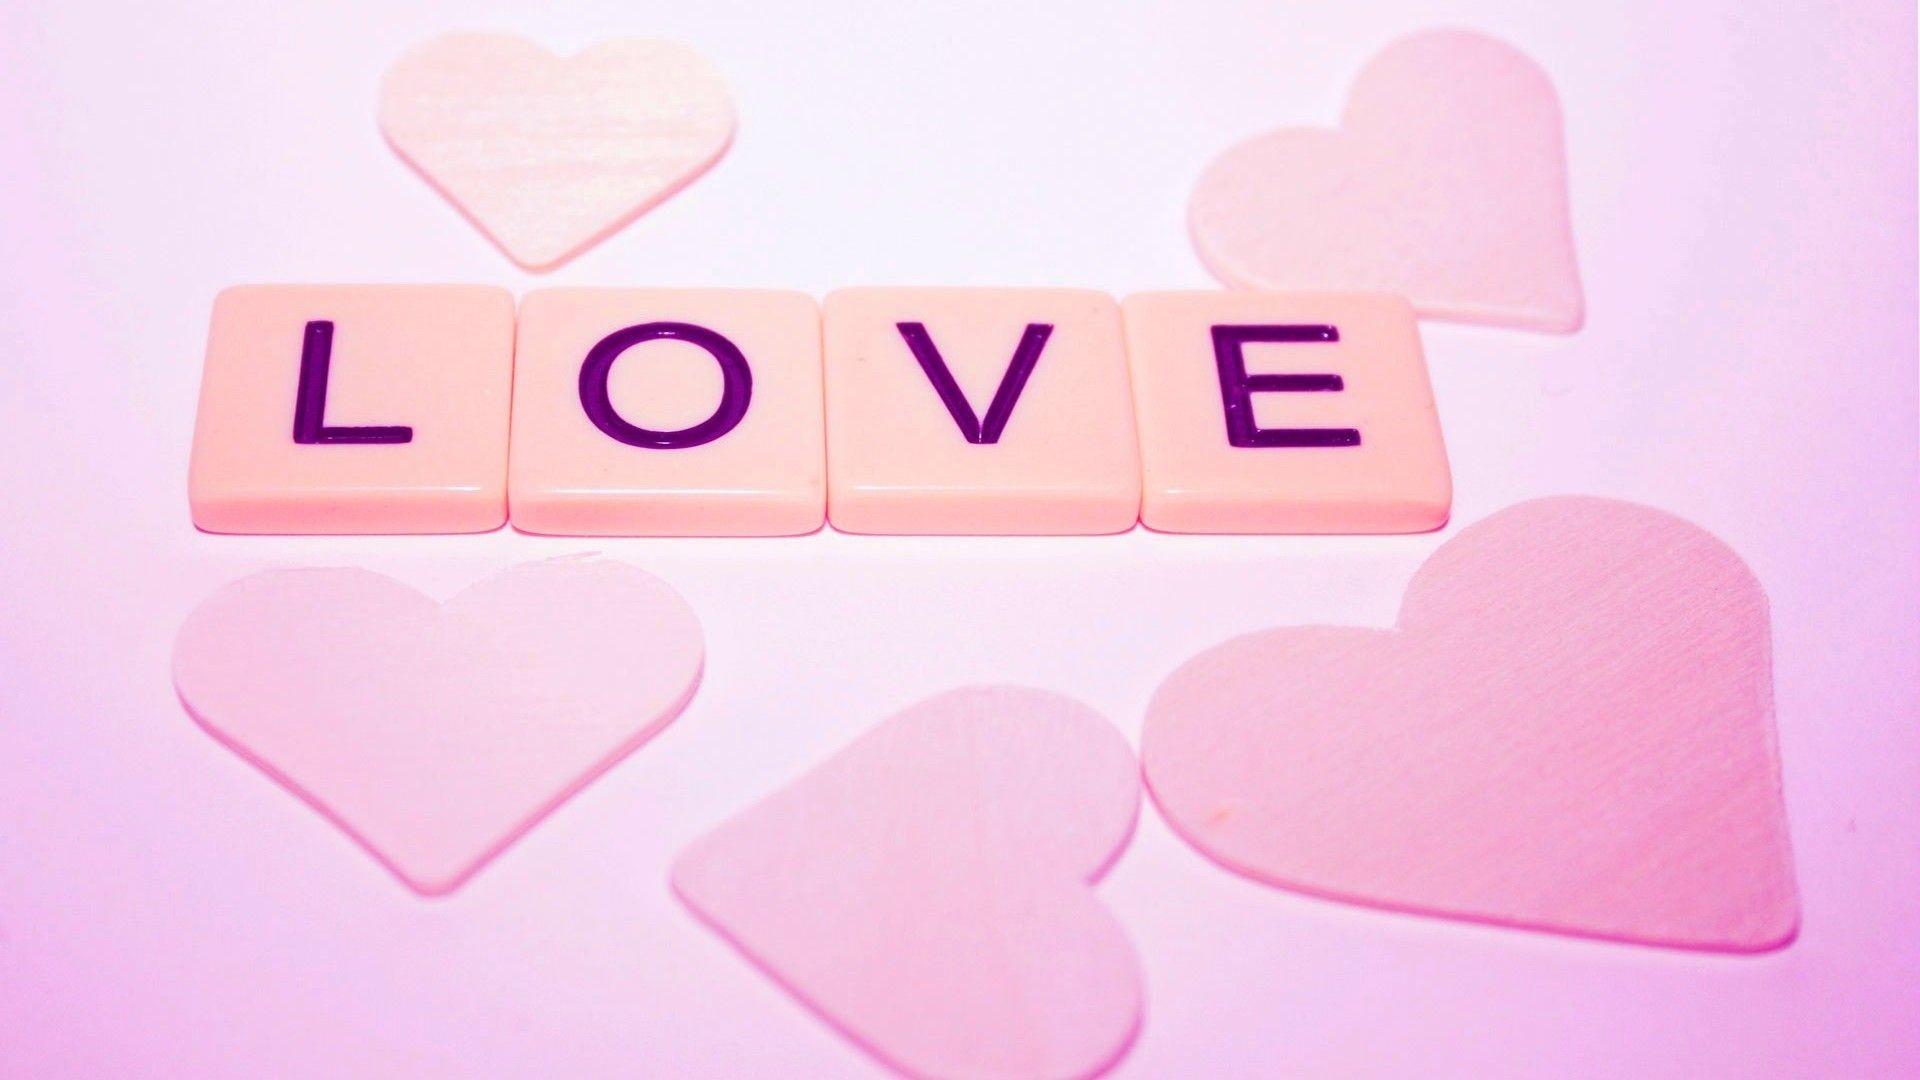 Cute Love Wallpapers For Desktop 66 Images